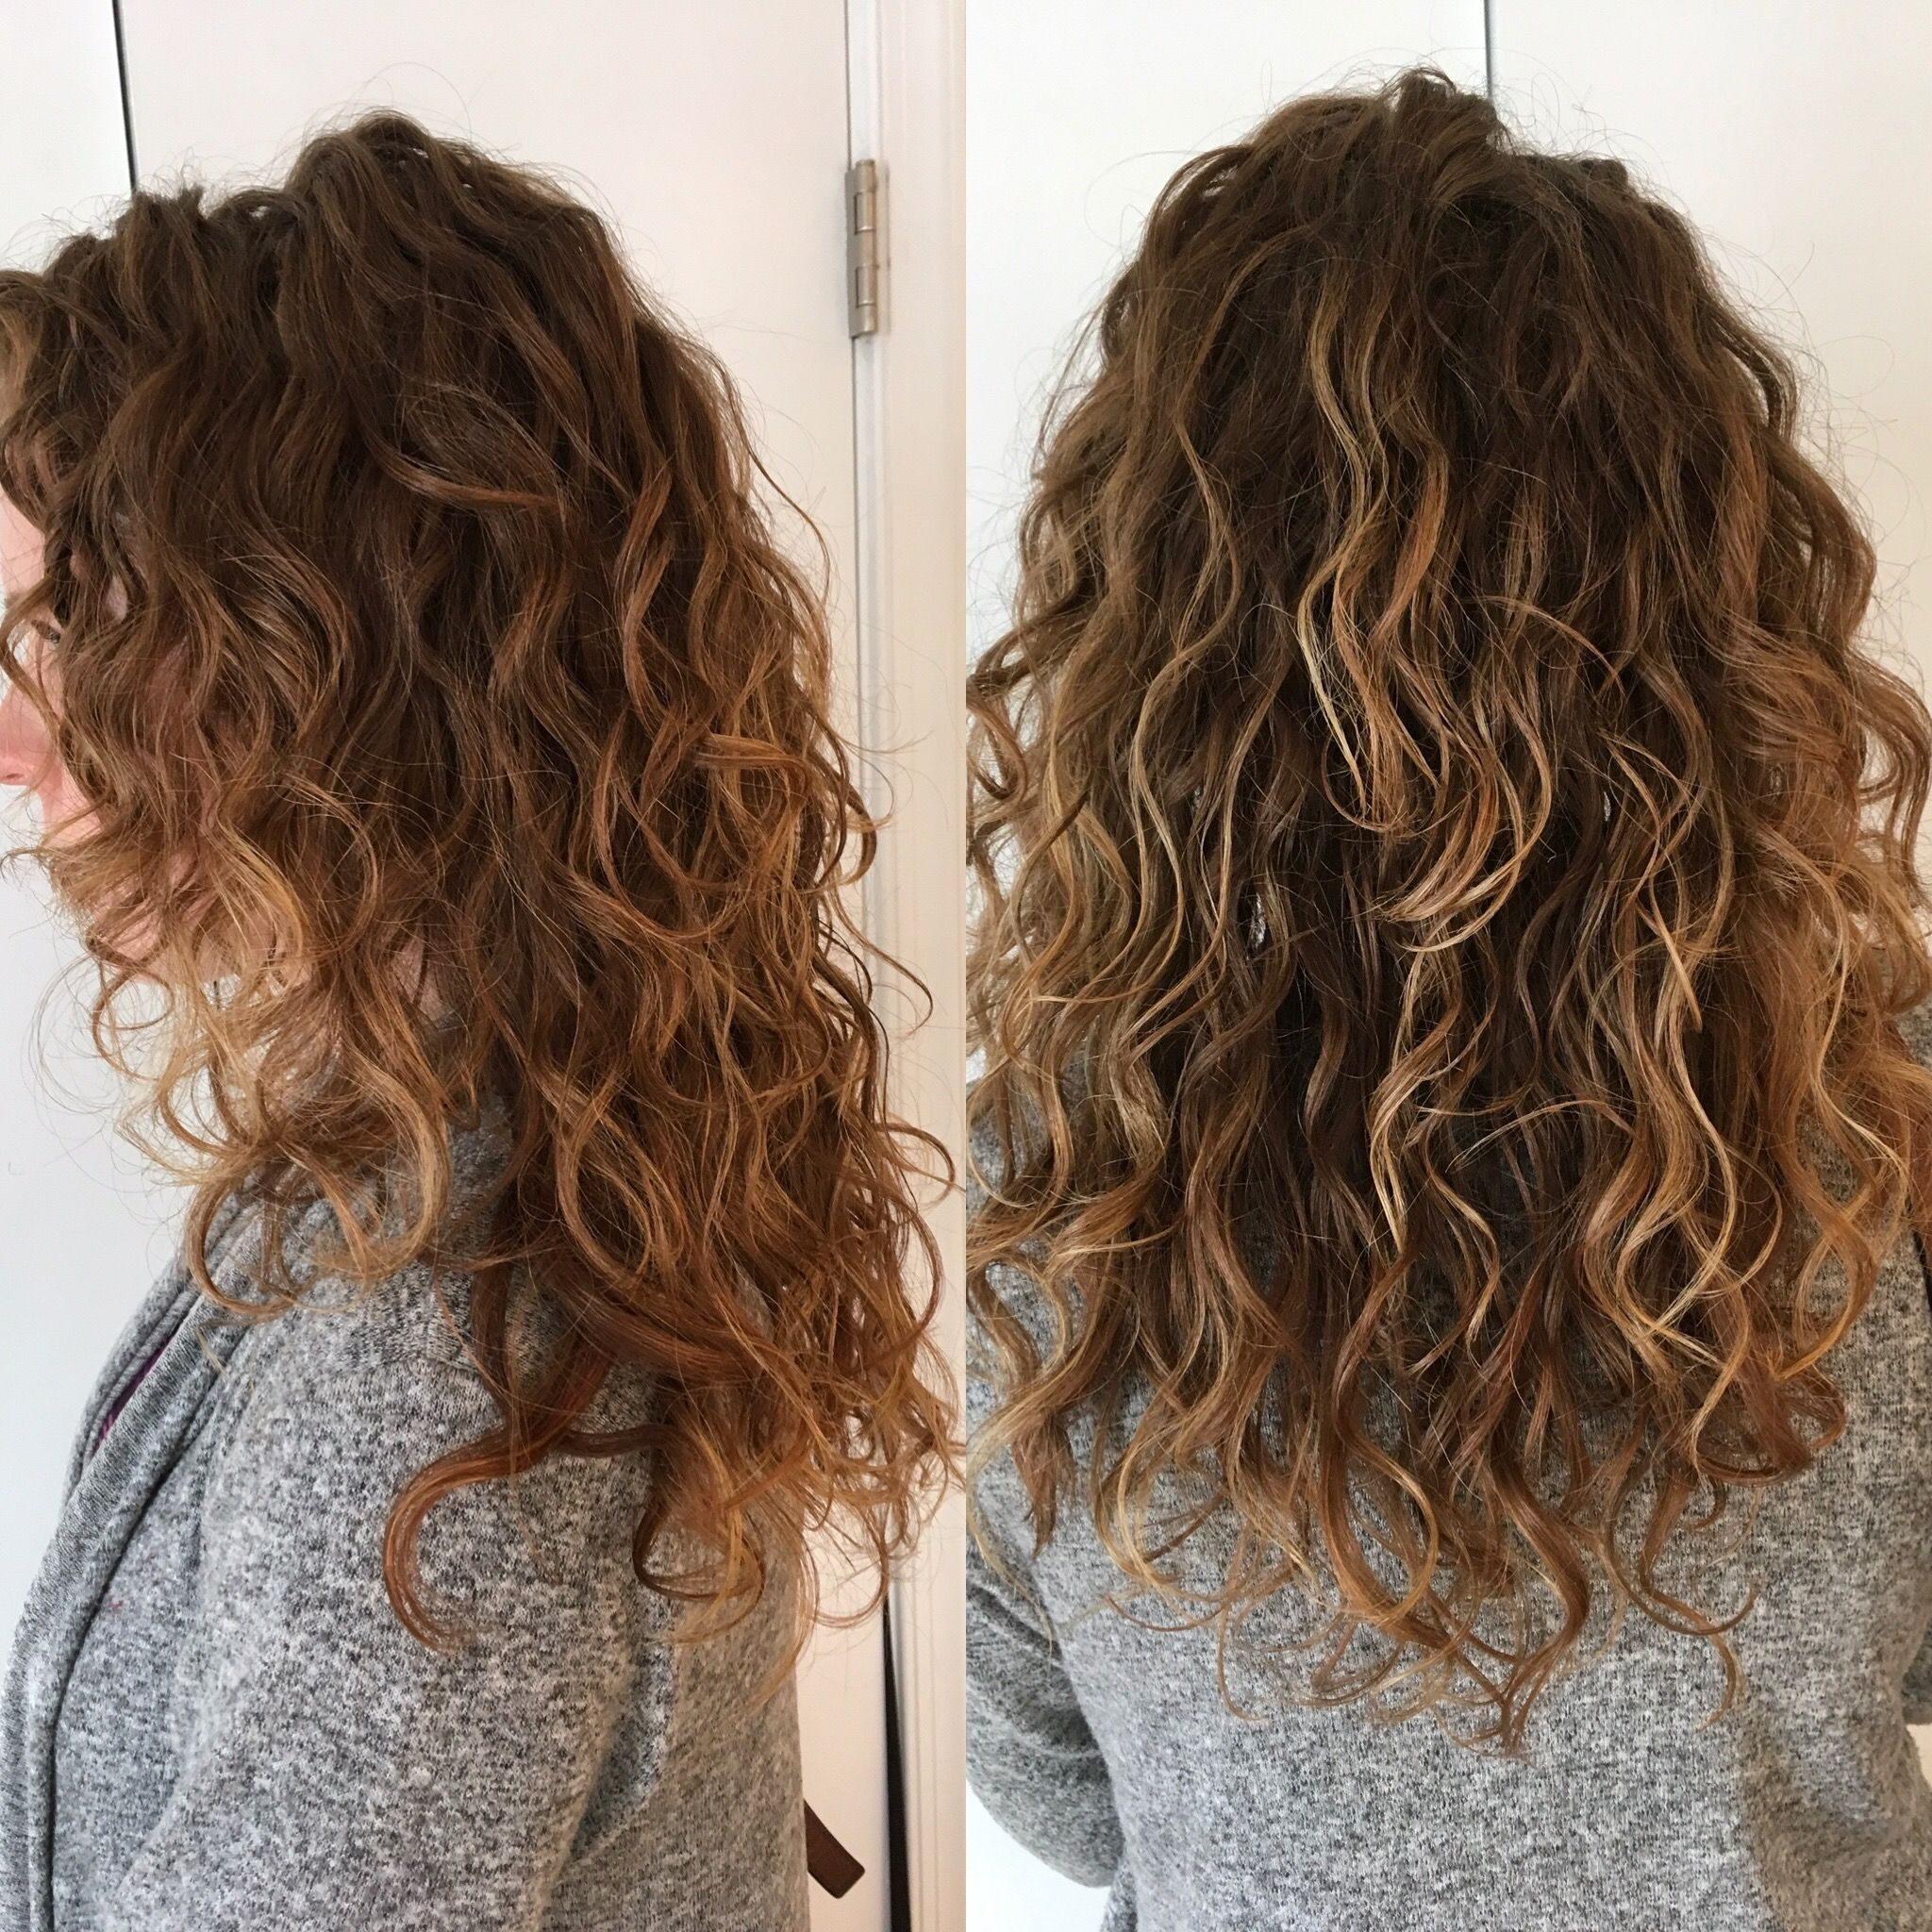 Pin By Darlene Regan On Curls Have More Fun Hair Styles Natural Curls Hairstyles Curly Hair Styles